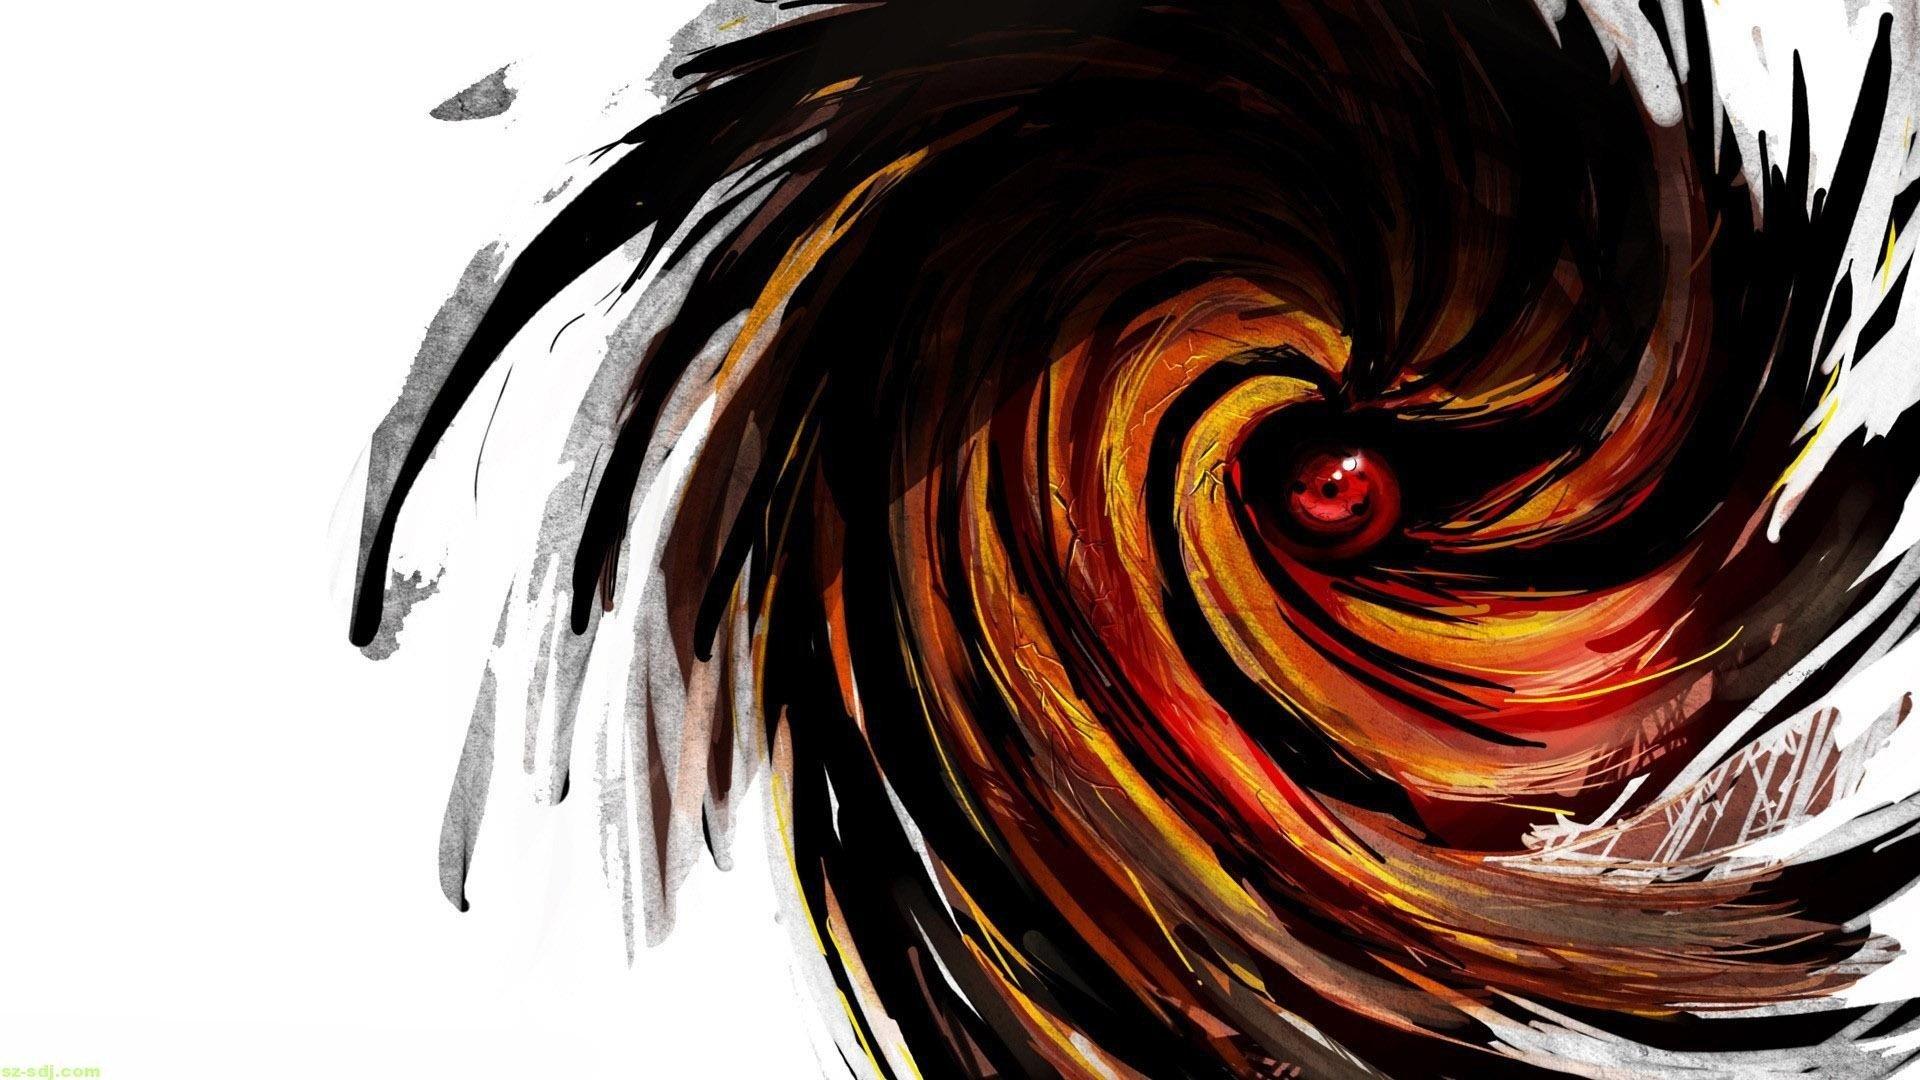 48 Sharingan (Naruto) HD Wallpapers   Backgrounds - Wallpaper Abyss